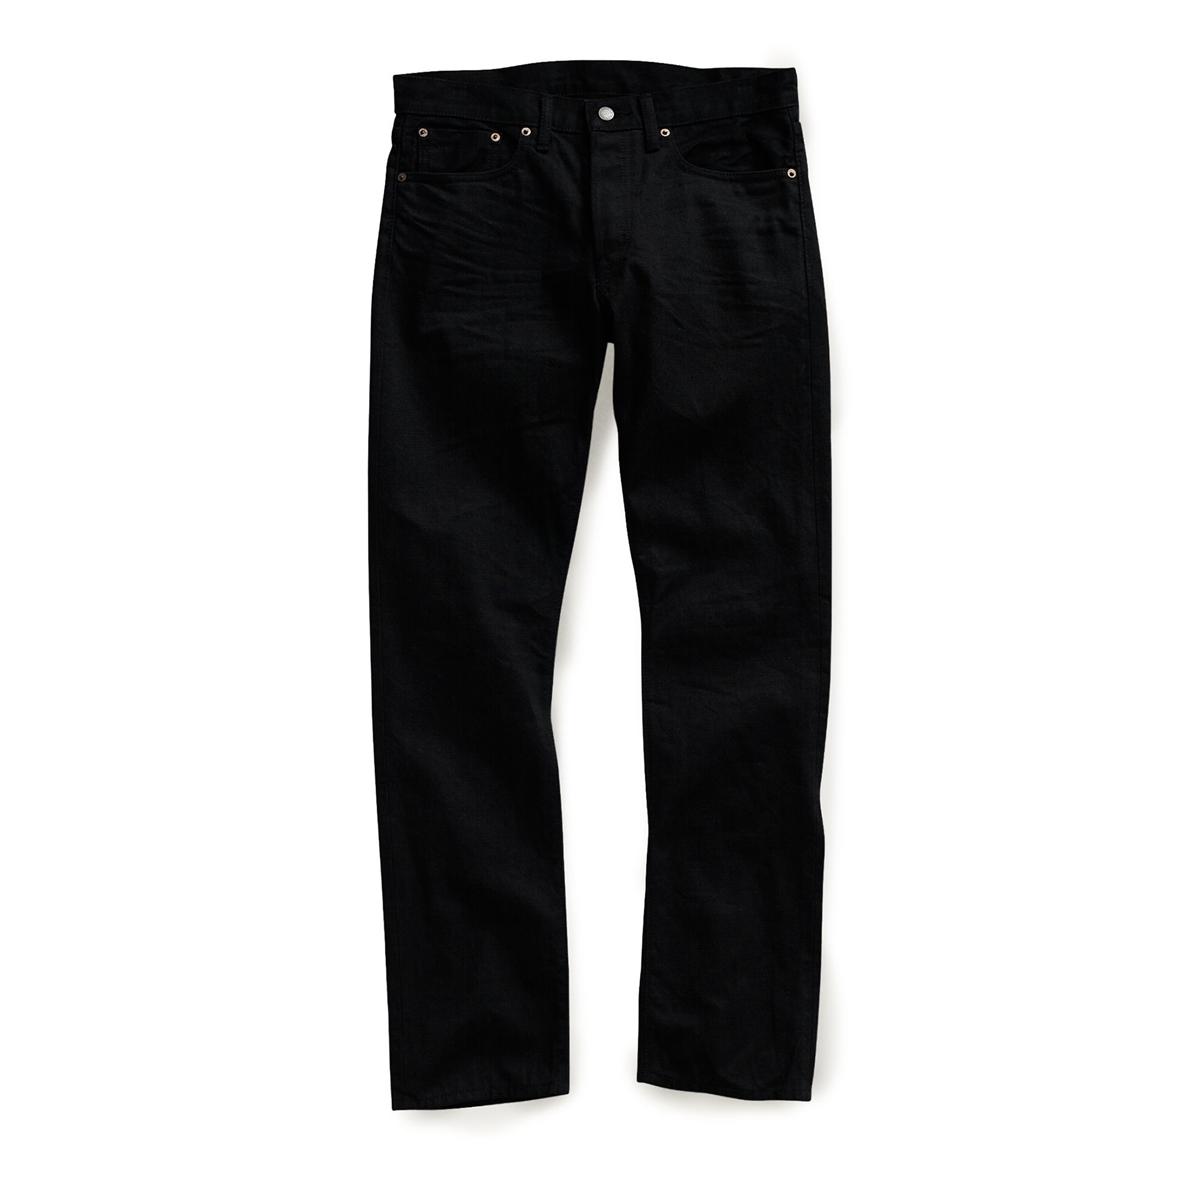 1fa52e1c1aa0 Ralph Lauren RRL Slim Fit Selvedge Denim Jeans New Black on Black Wash Size  29-Premium Denim